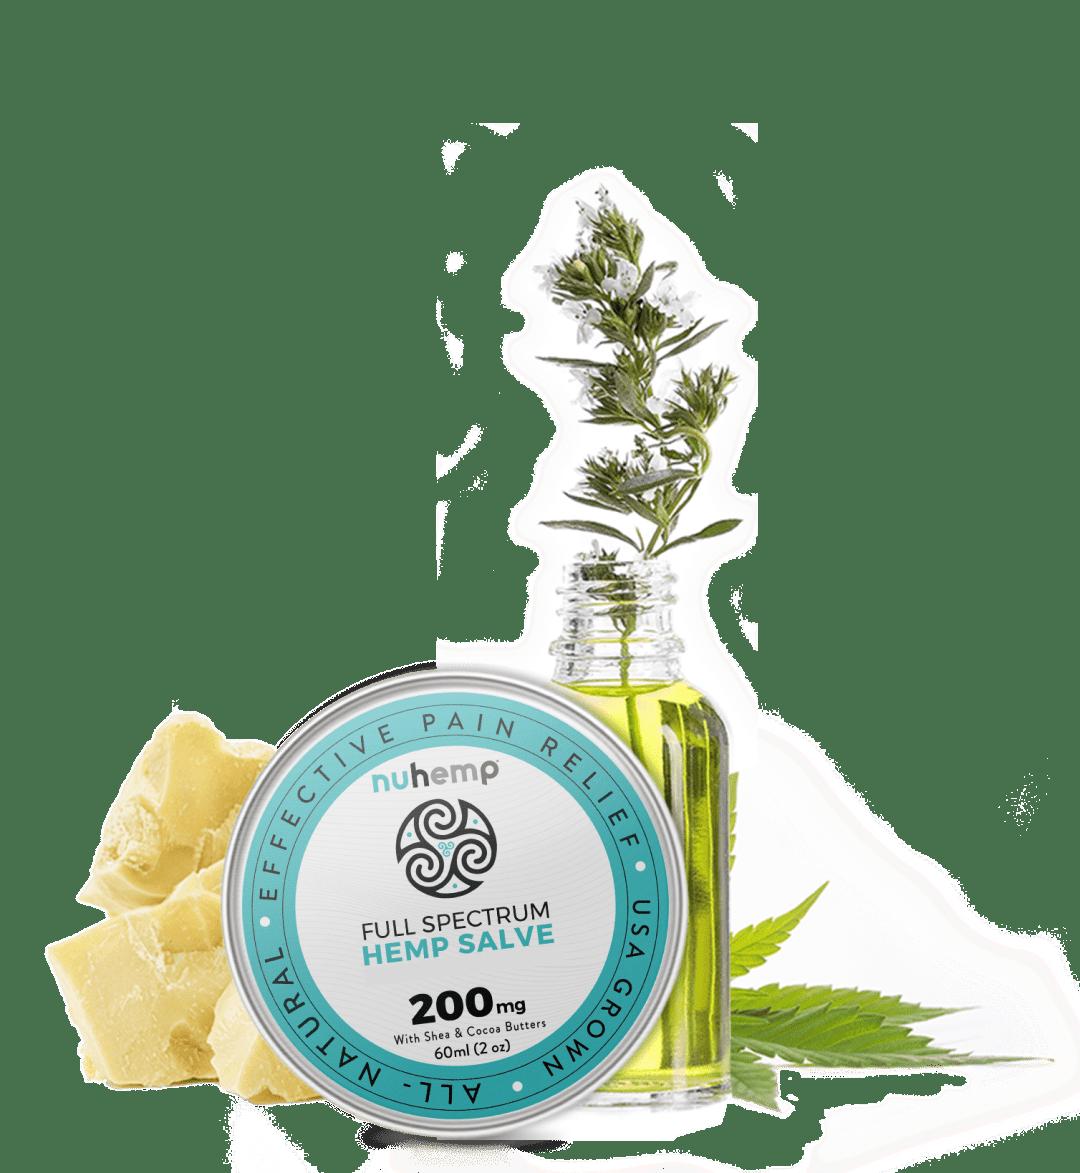 Nuhemp hemp salve essentials oils with shea butter and cocoa butter